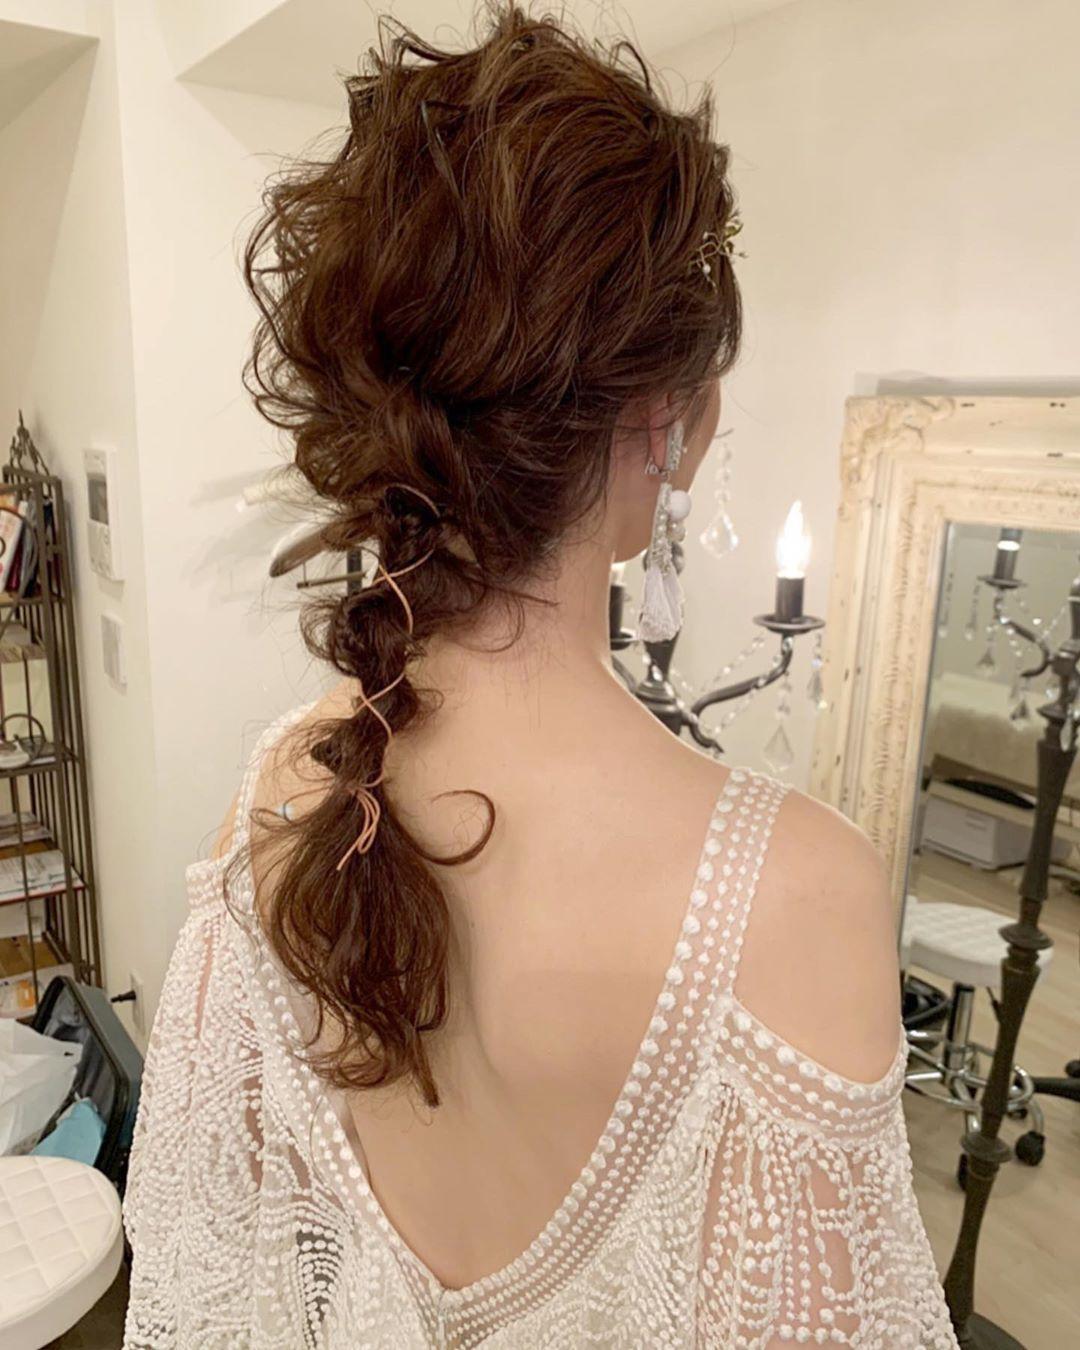 "Kiyo (atelier S'appuyer) on Instagram: ""本日一組目はハワイで挙式されて日本で1.5次会をされるということで、お支度のみアトリエにてさせていただきました。  ドレスもとっても可愛いし、ランジャナカーンのイヤリングもとても可愛いし😍  ヘアスタイルはすこしウェットにさせたゆるゆるあみおろしに。…"""